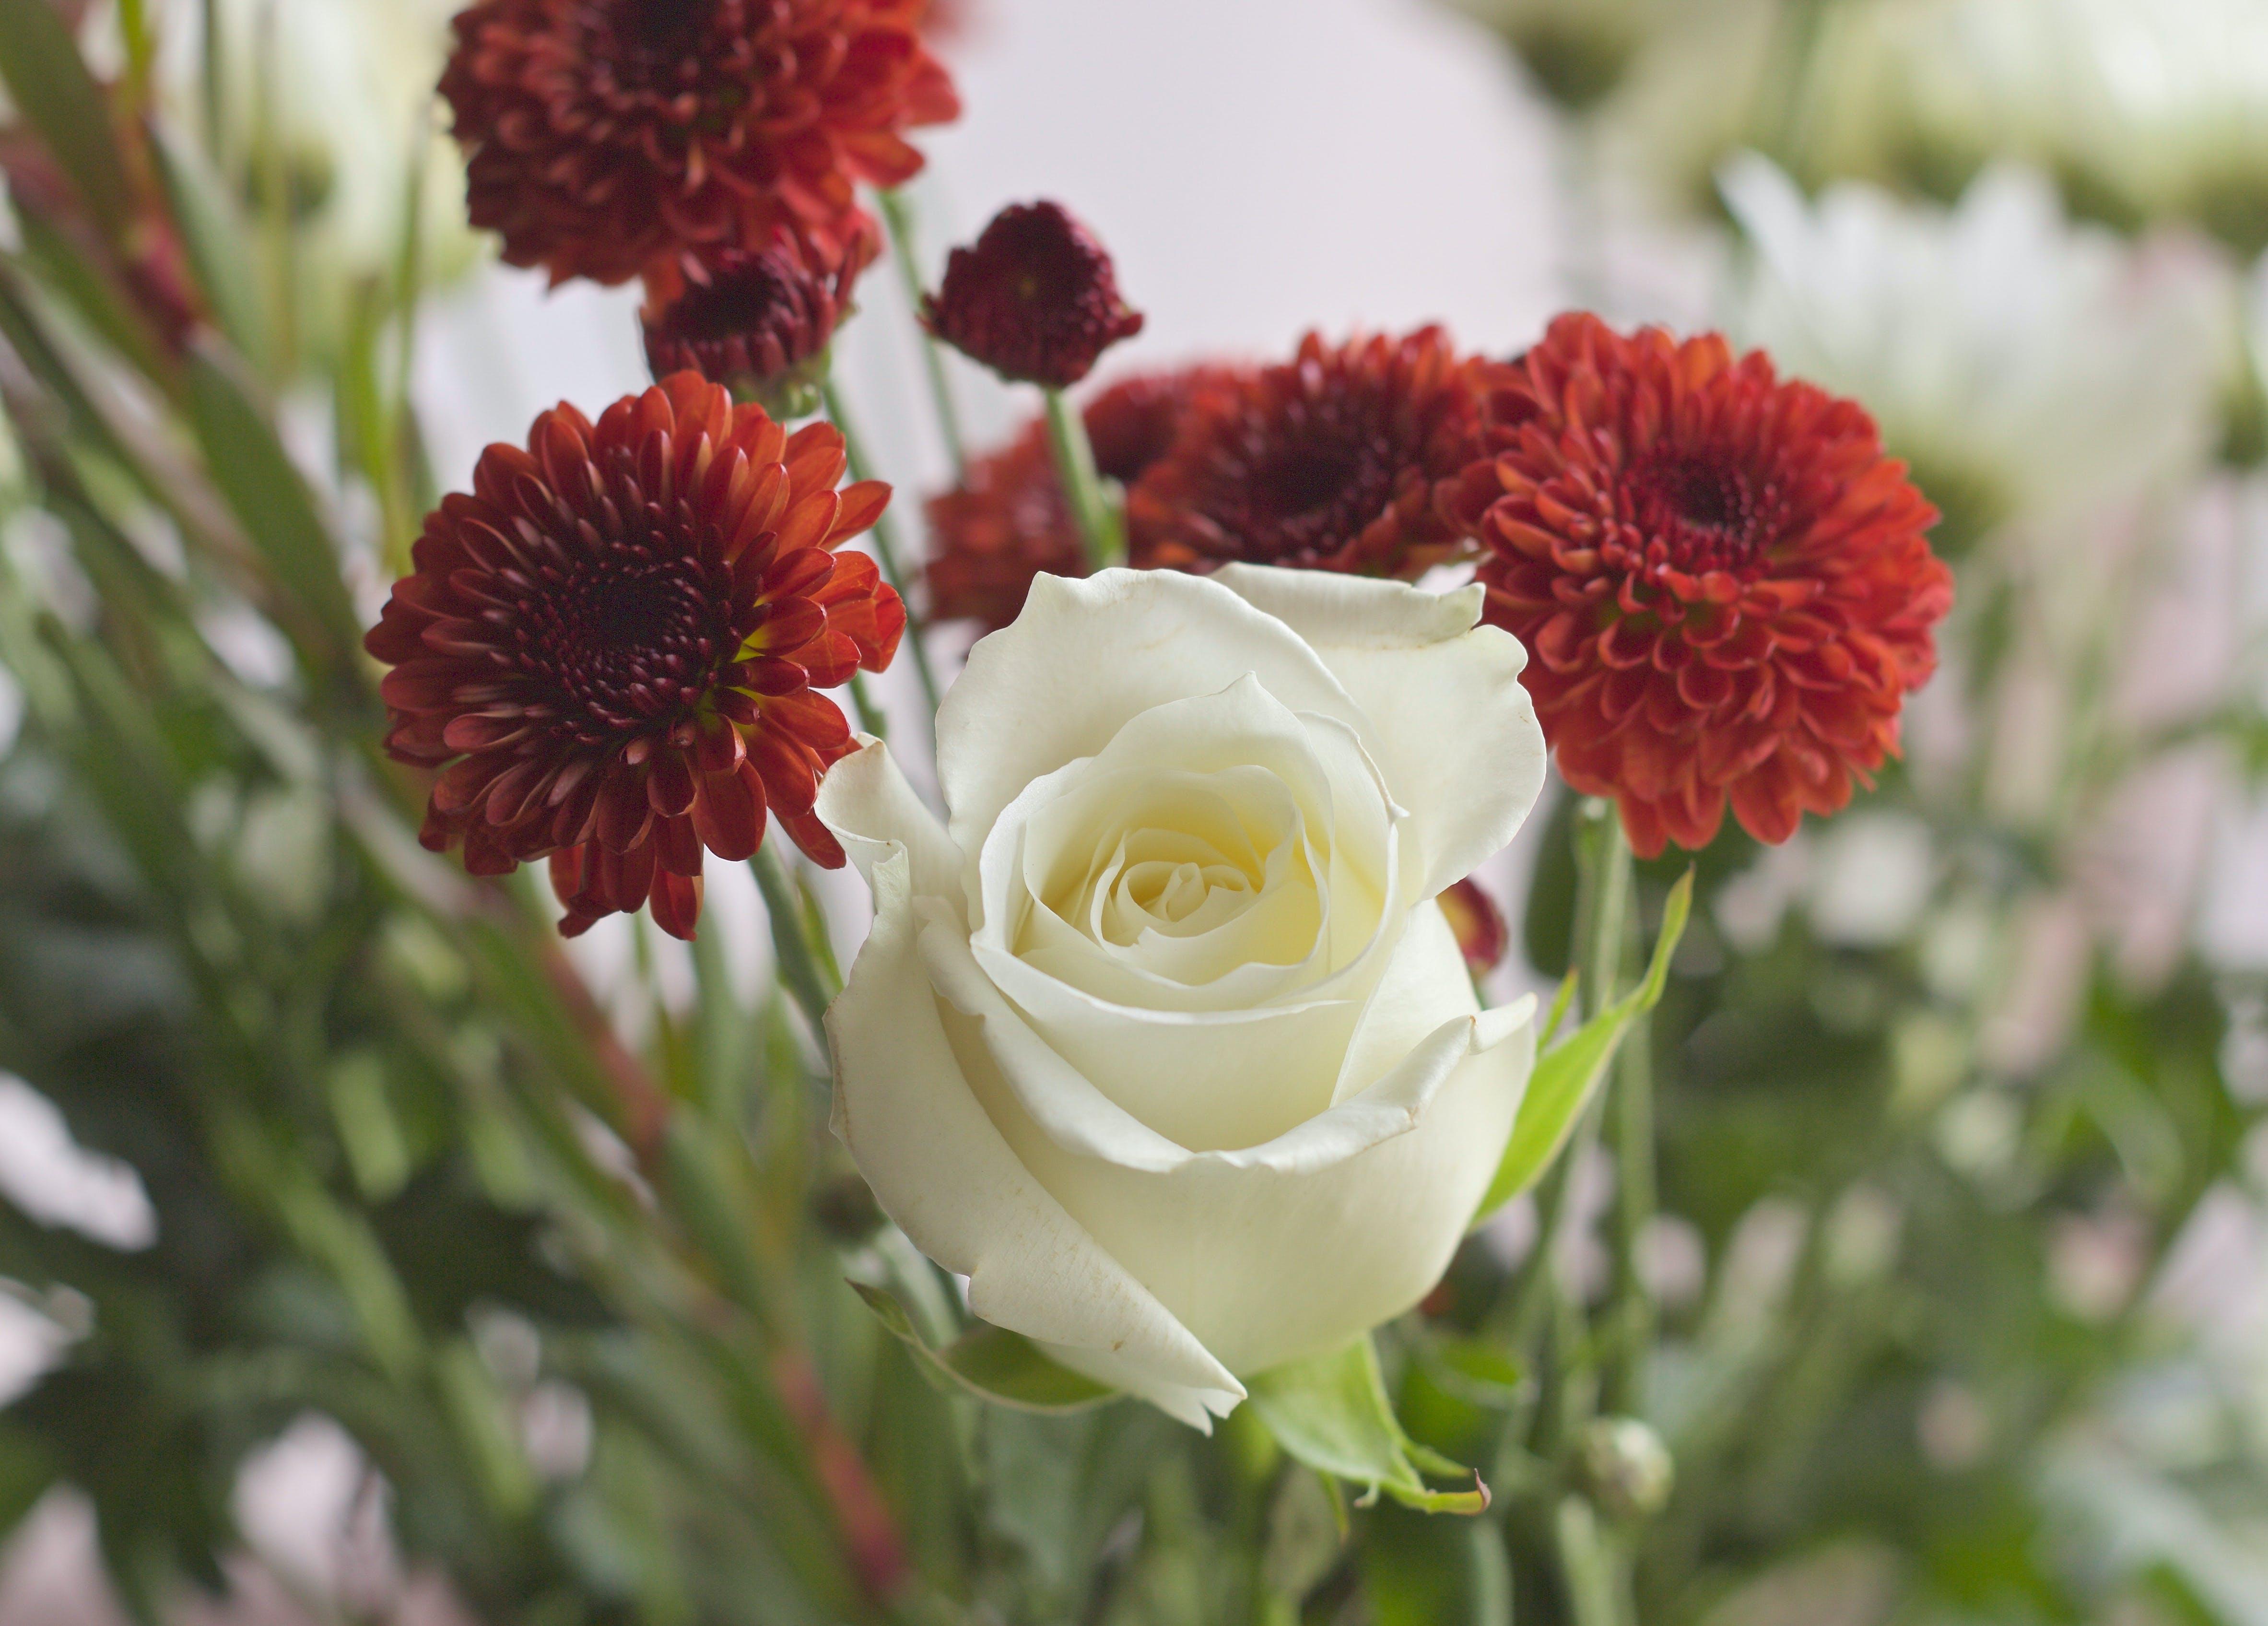 flowers, petals, valentines day